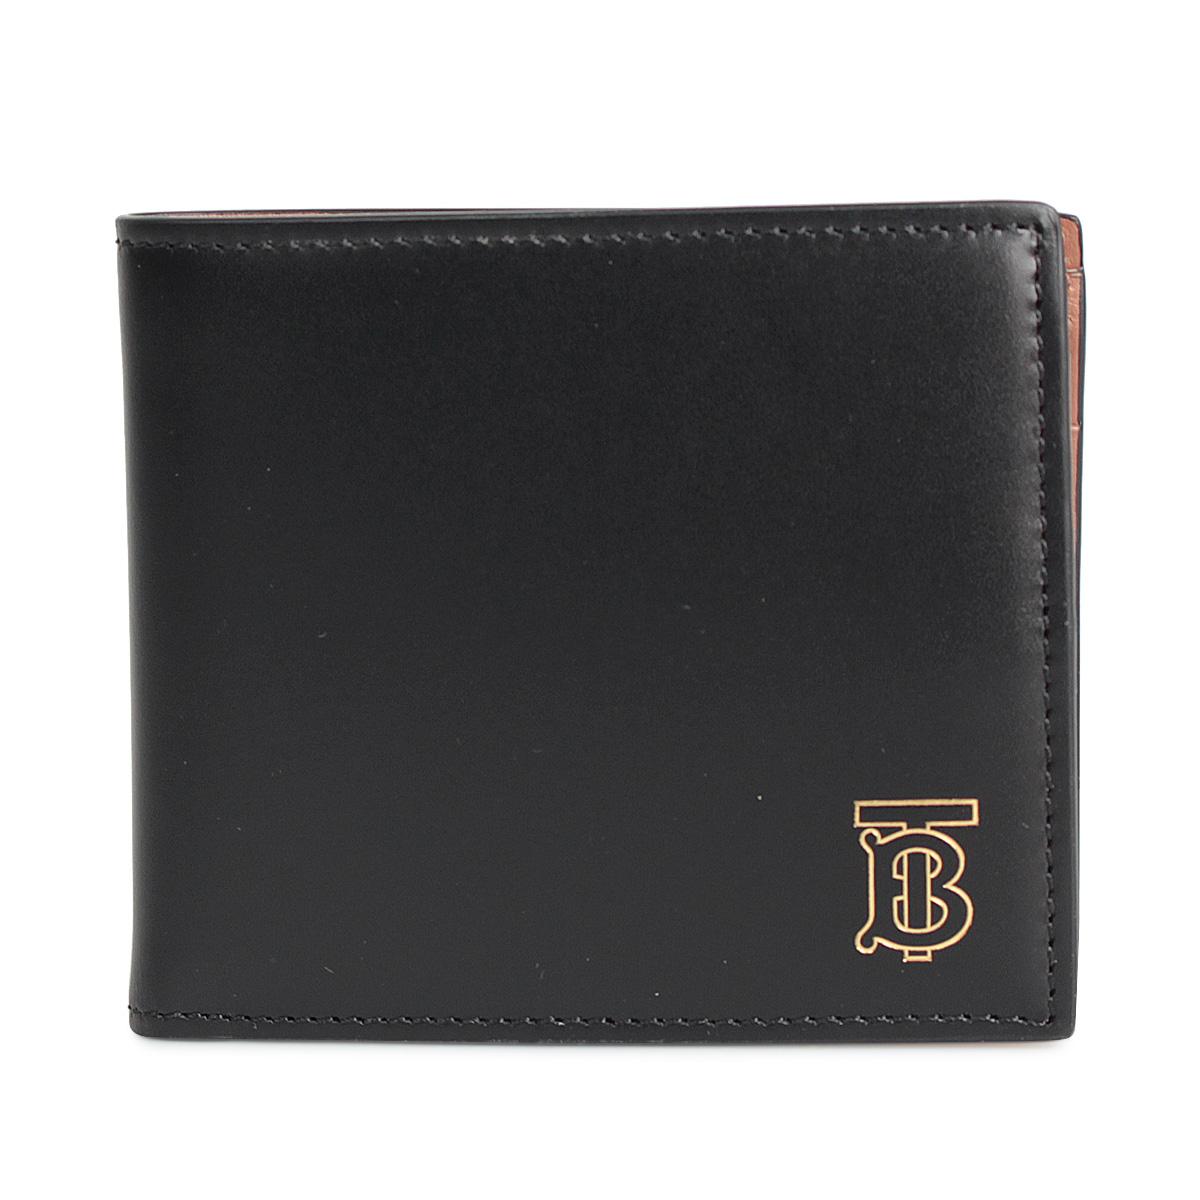 BURBERRY CC BILL COIN バーバリー 財布 二つ折り メンズ ブラック 黒 8014024